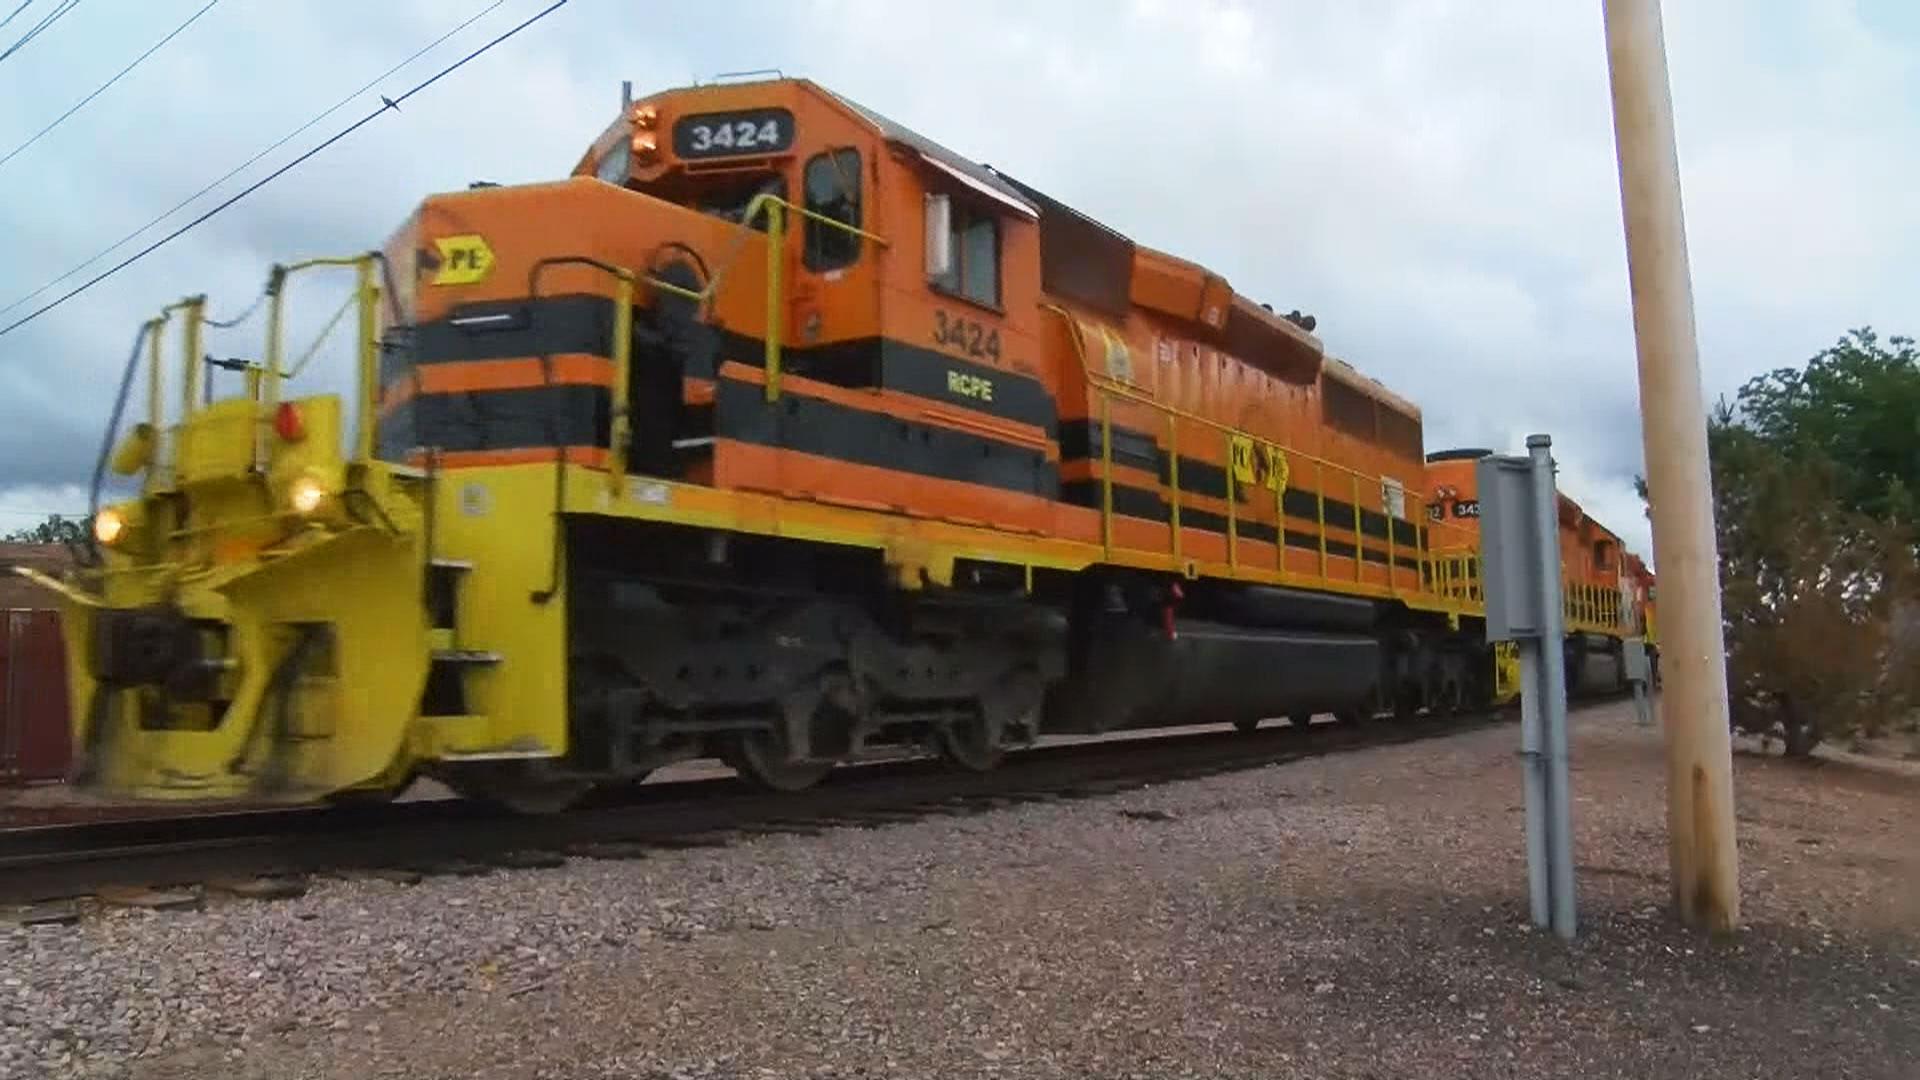 KELO Train